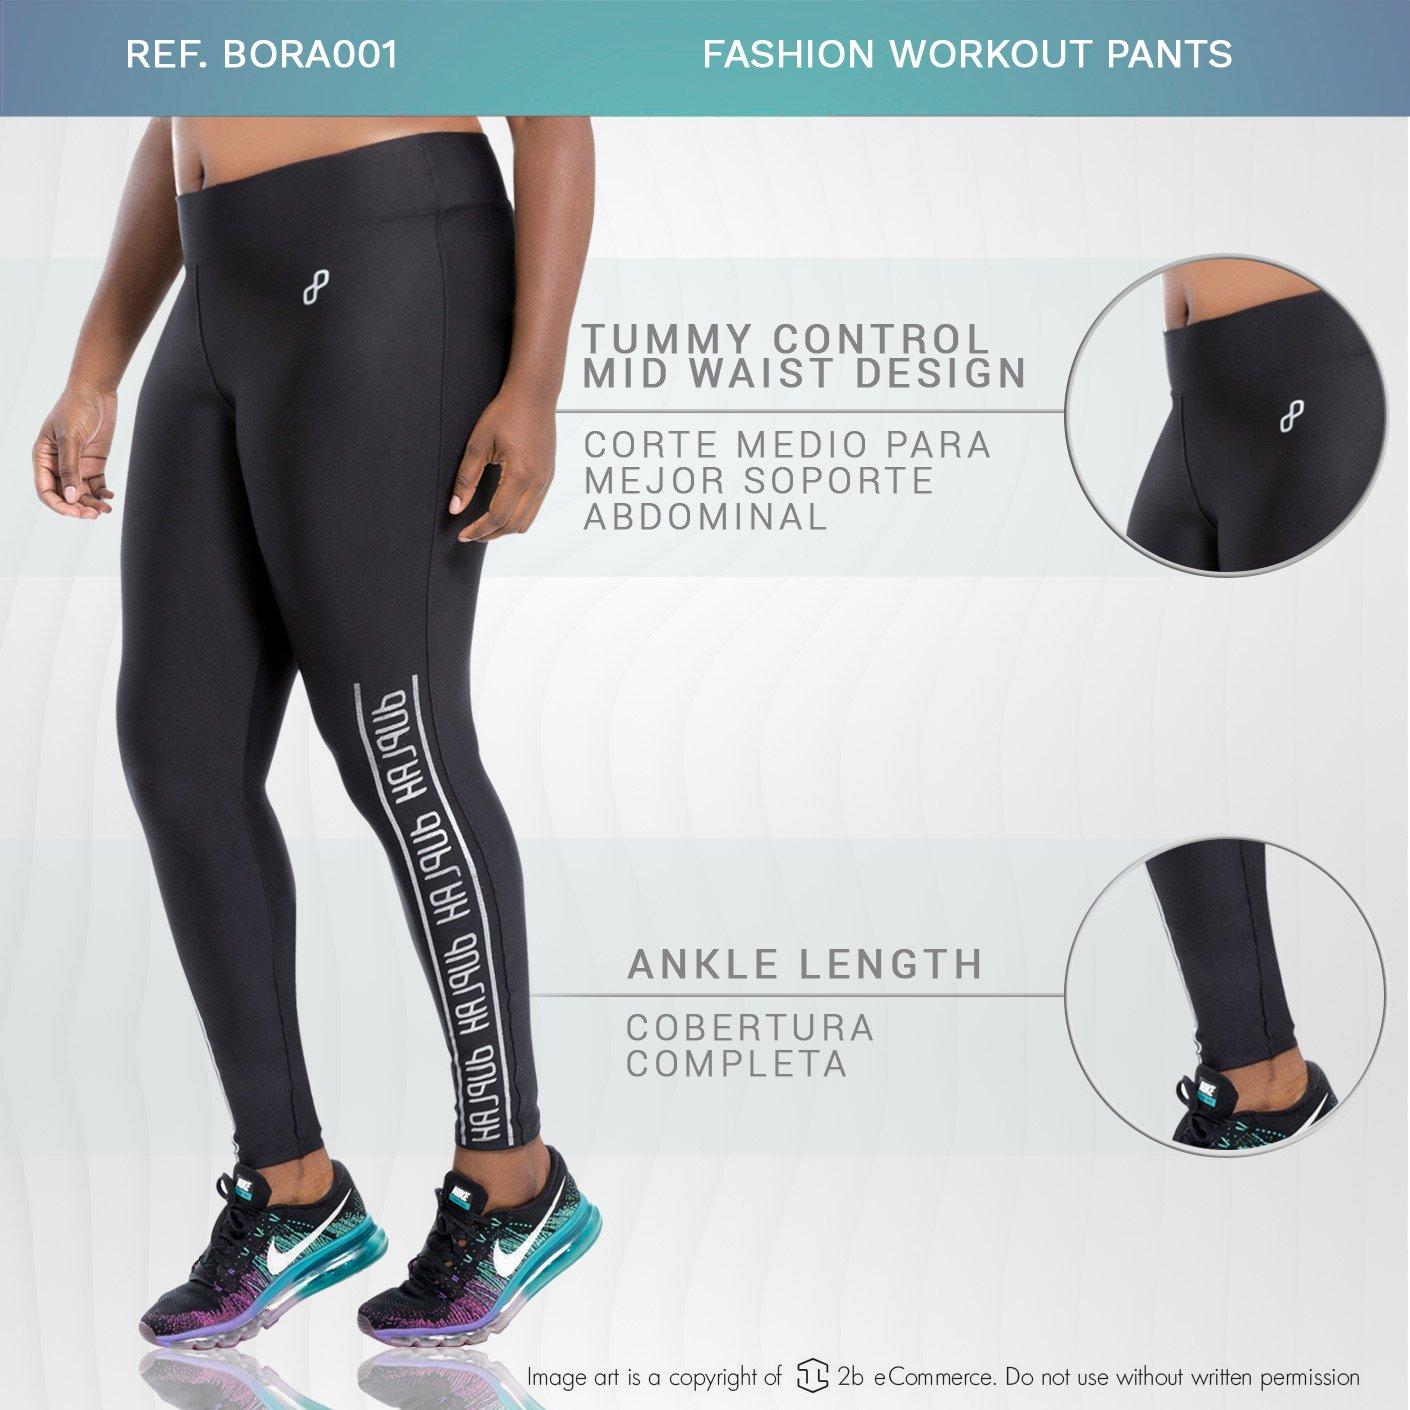 42f0eb6c8ba20 Duplah Bora Bora Womens Fashion Workout Pants Plus Size Leggings Ropa  Deportiva at Amazon Women's Clothing store: